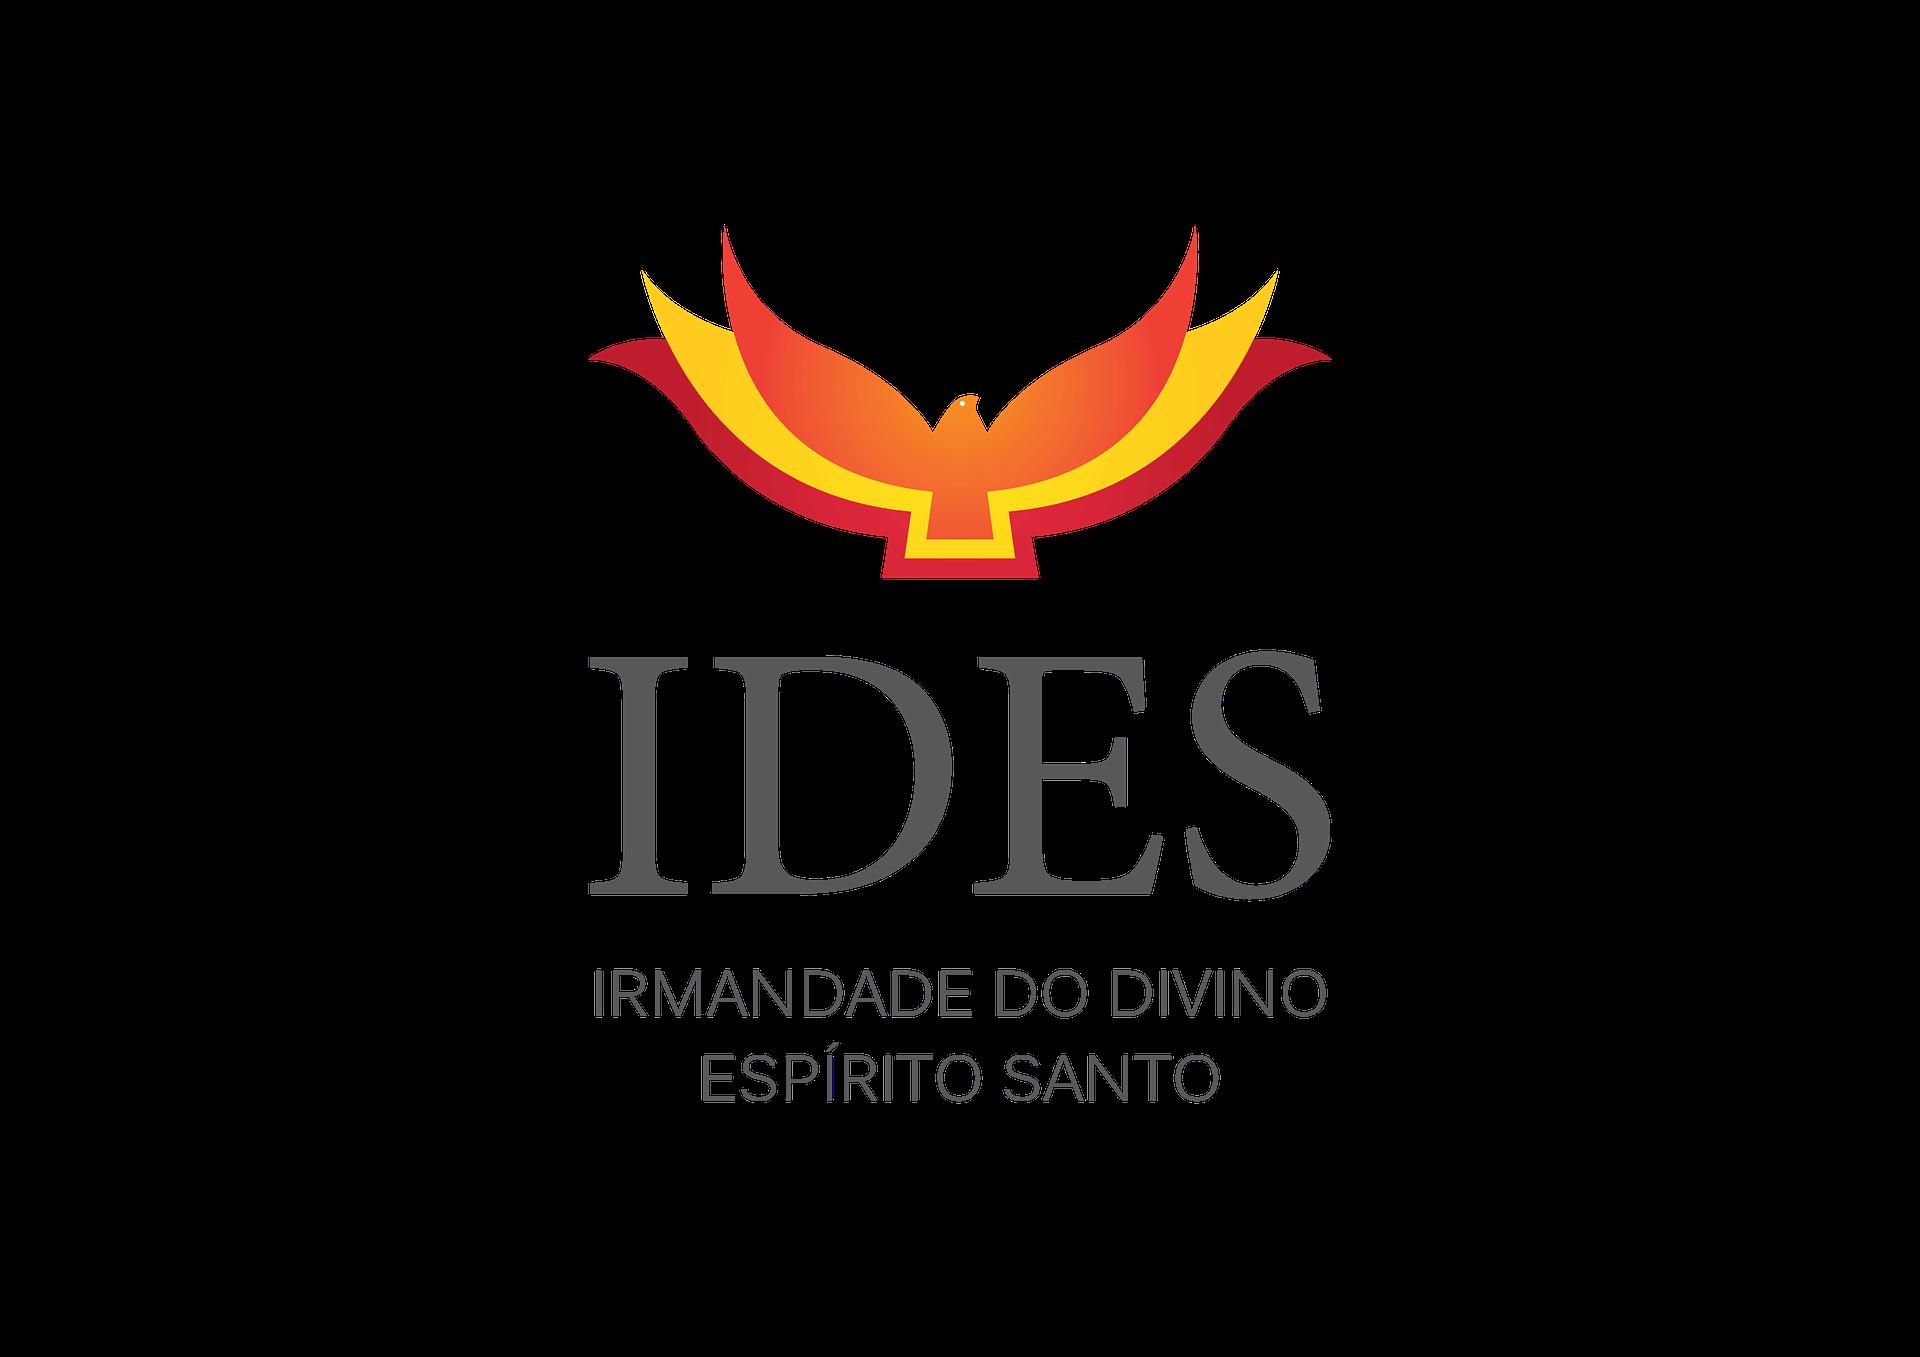 IDES_LOGO fonte cinza (5)